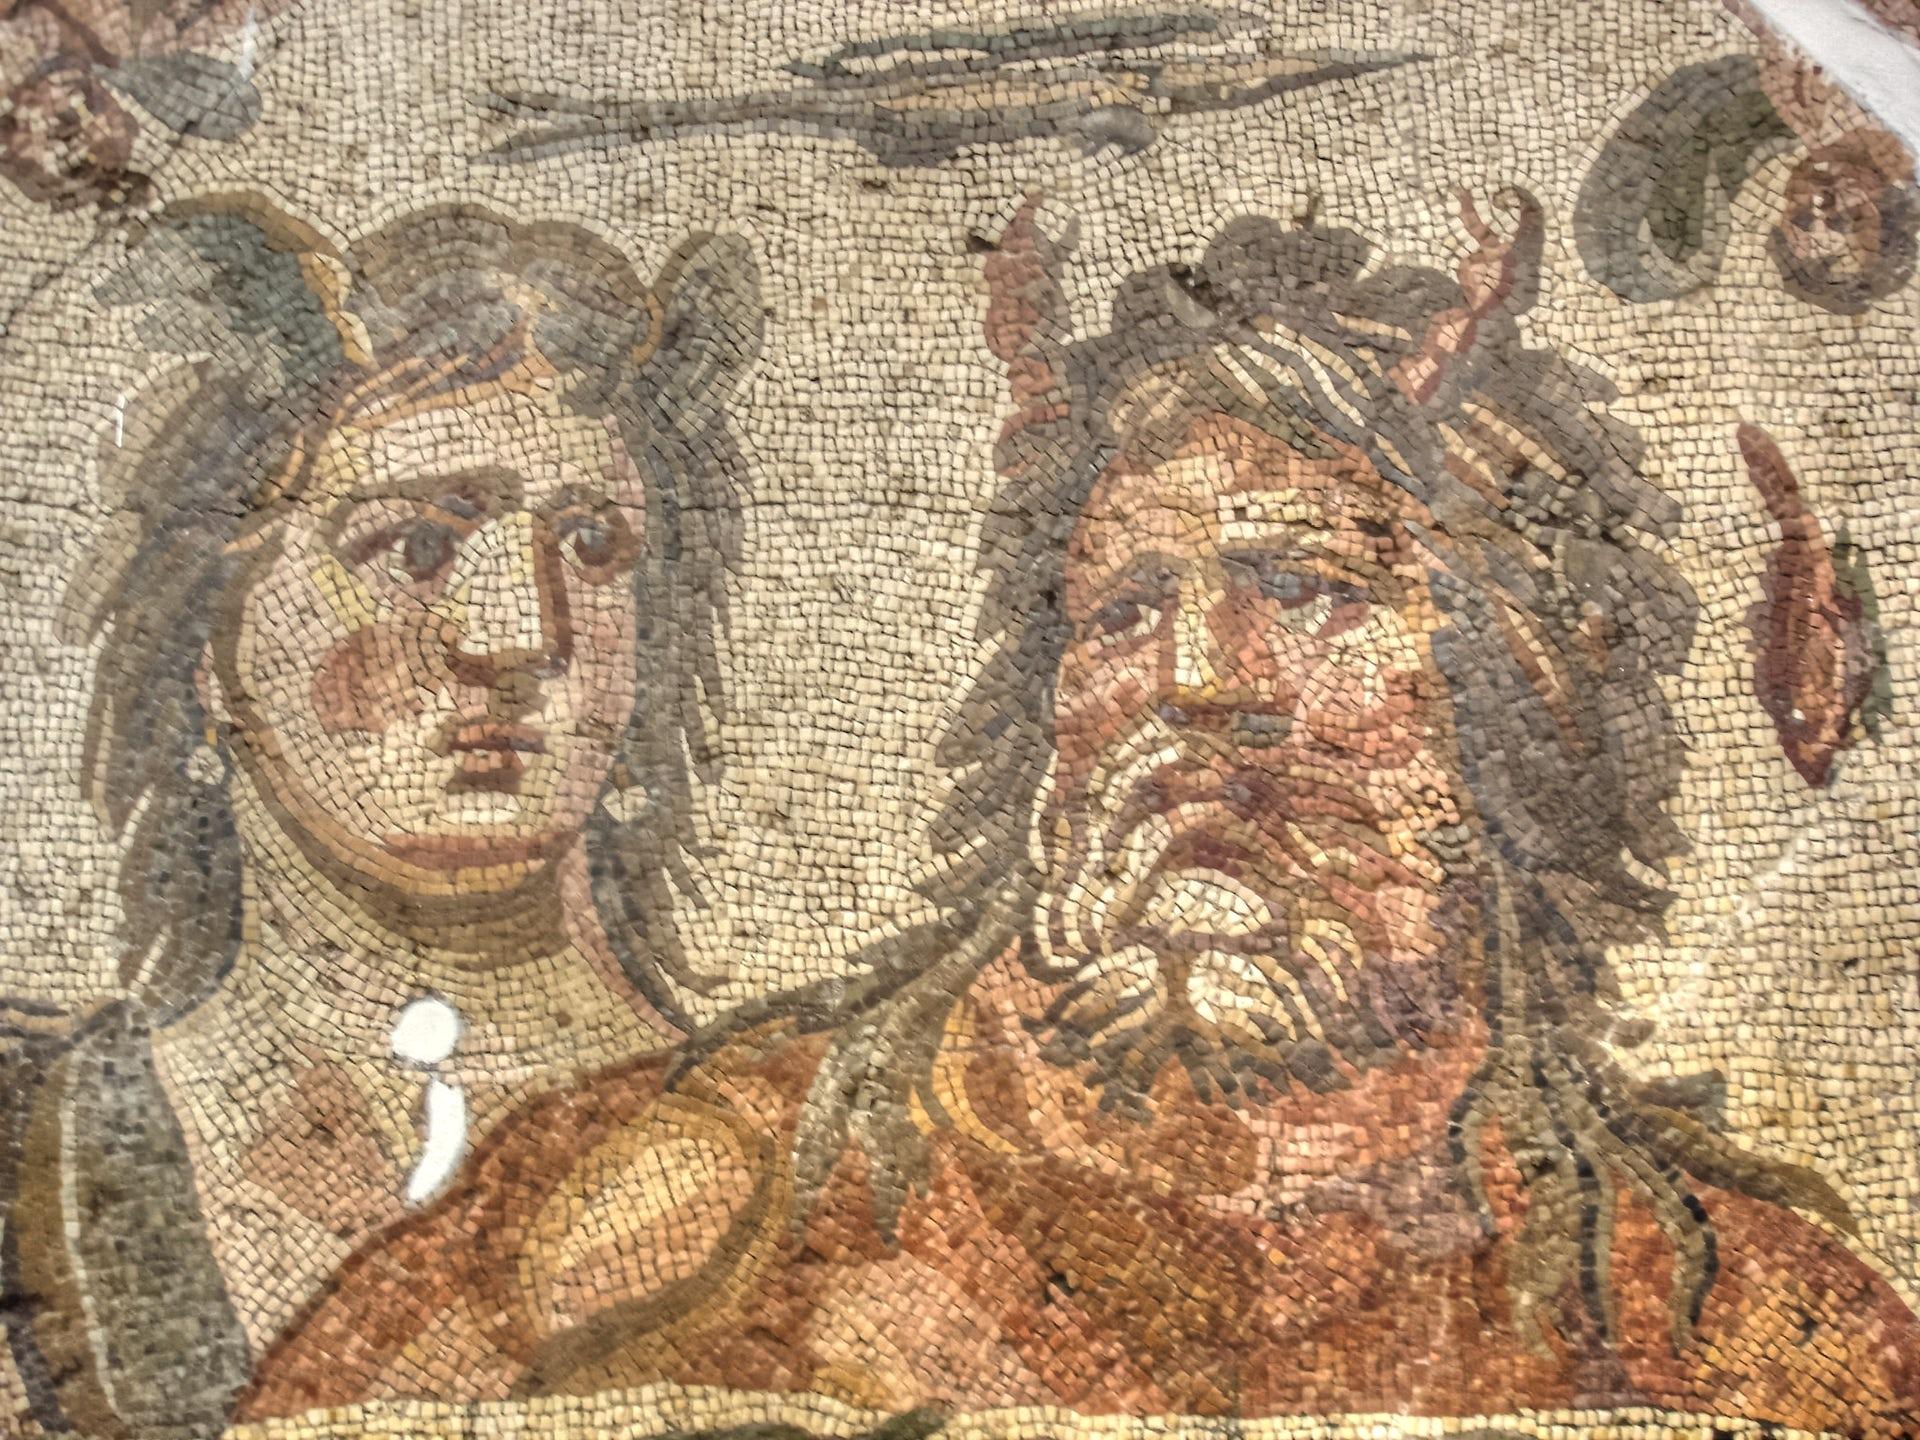 Kinship Myth in Ancient Greece